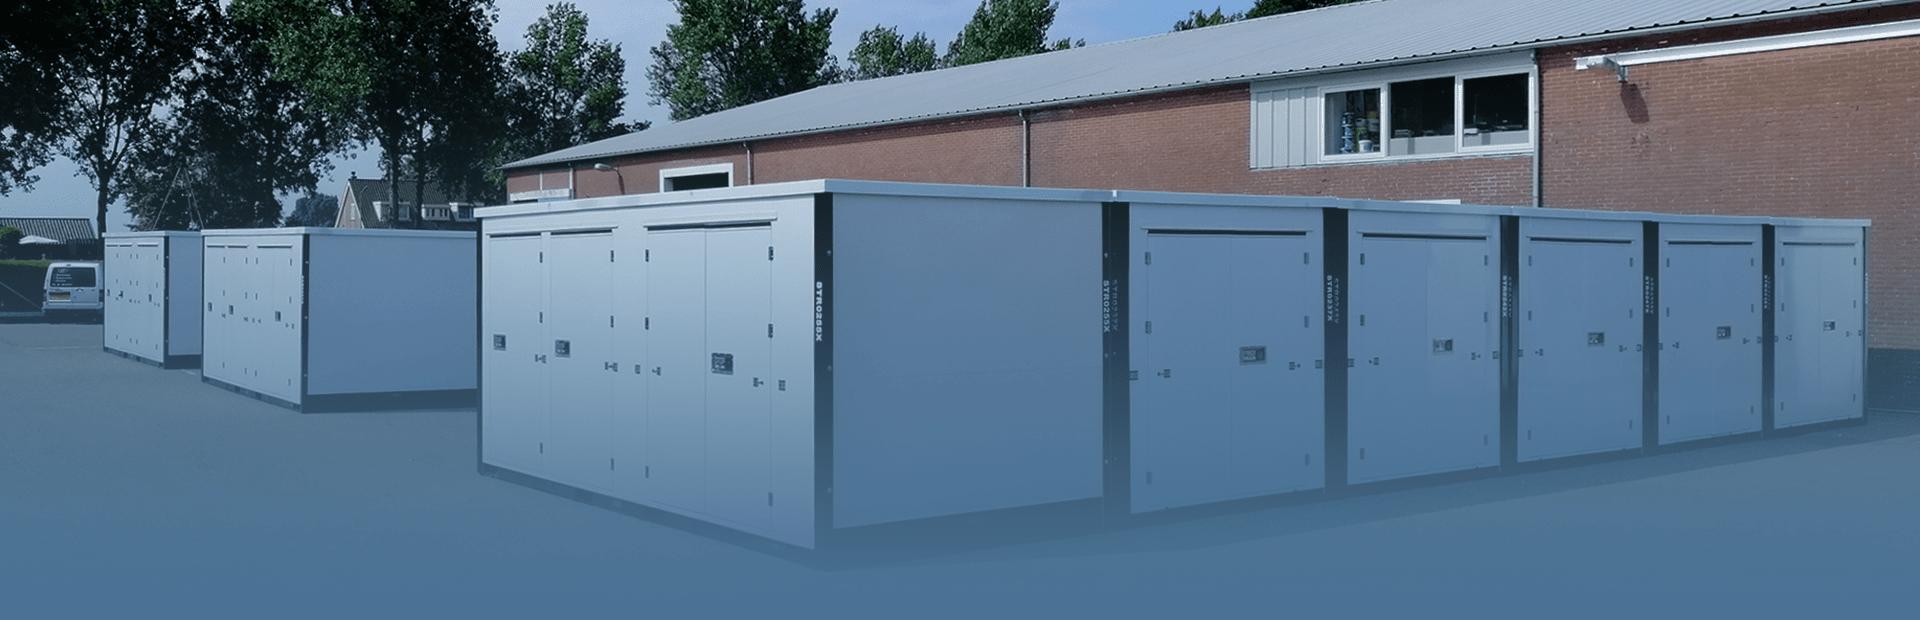 Storage420_breidt_self_storage_uit